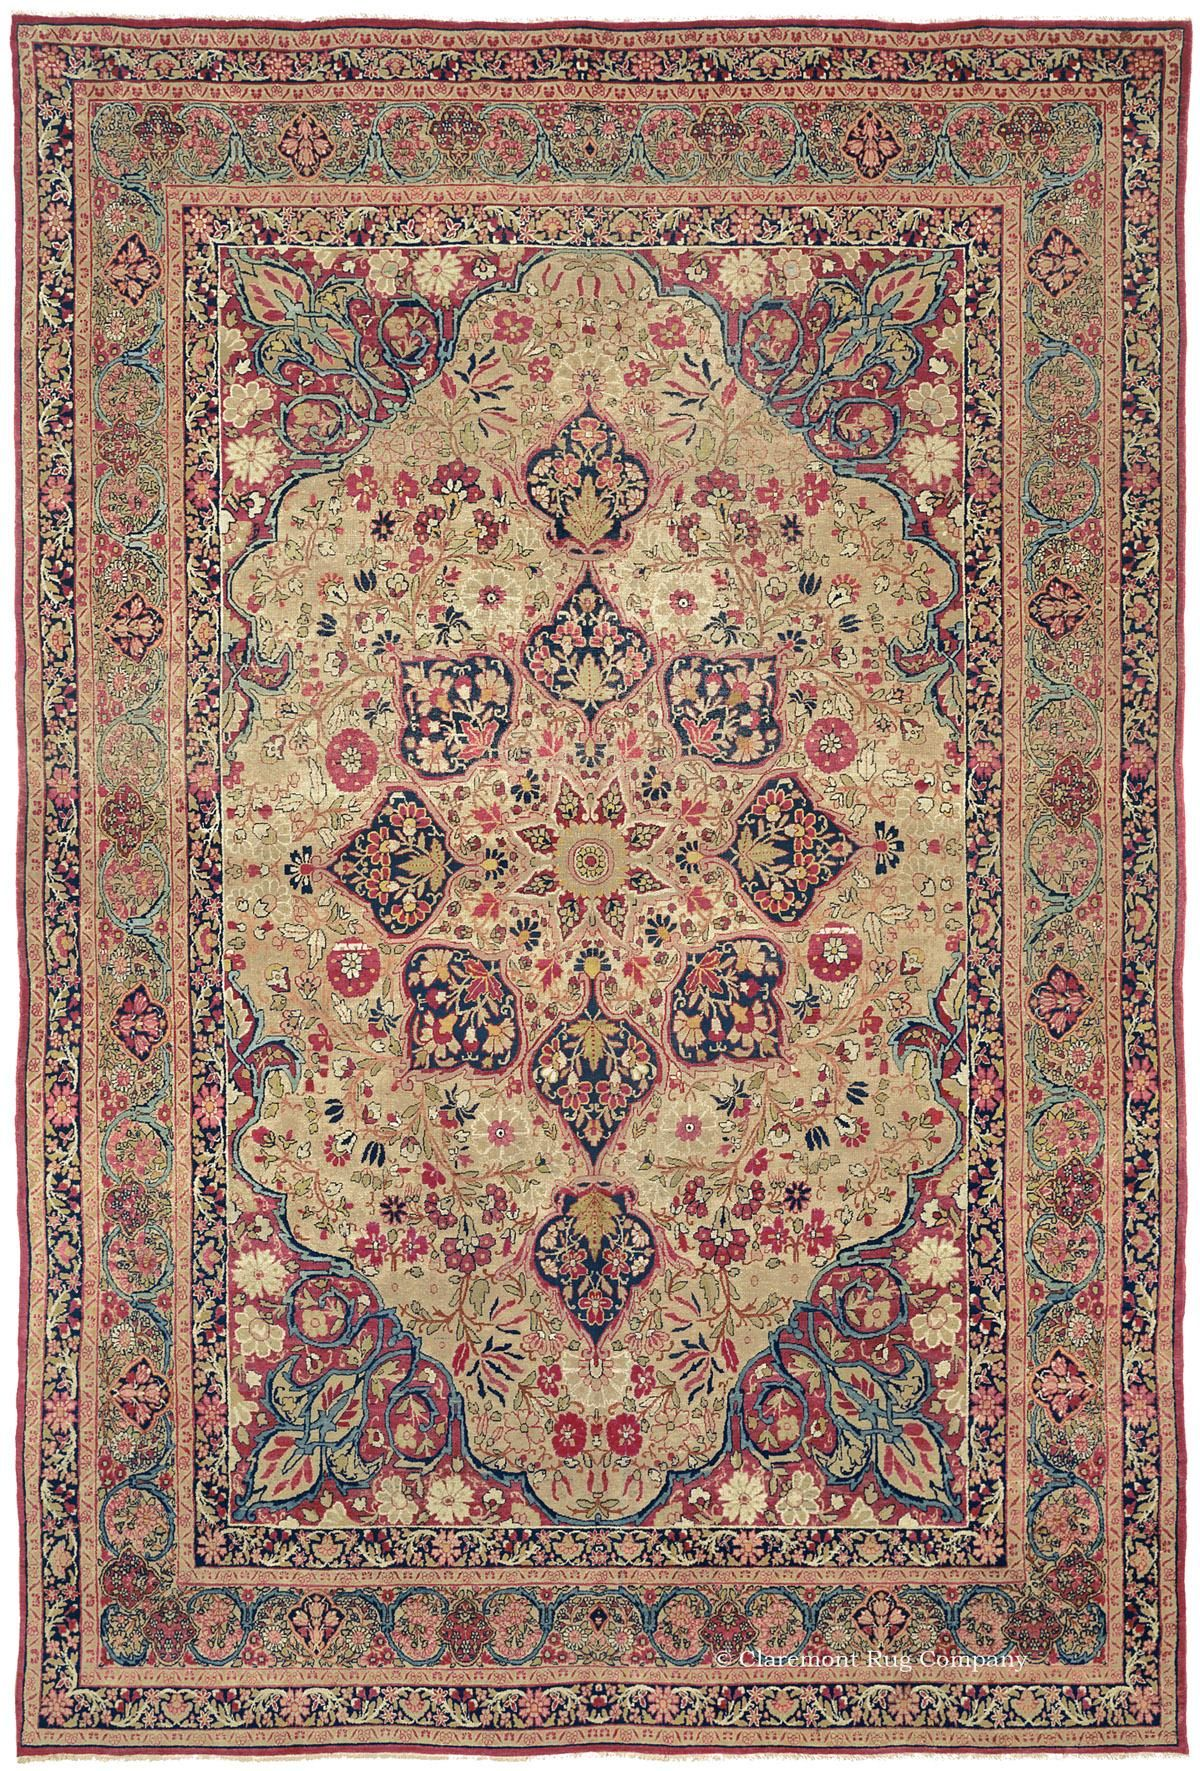 Laver Kirman Southeast Persian 7ft 10in X 11ft 5in Circa 1875 Rugs On Carpet Rugs Persian Rug Designs